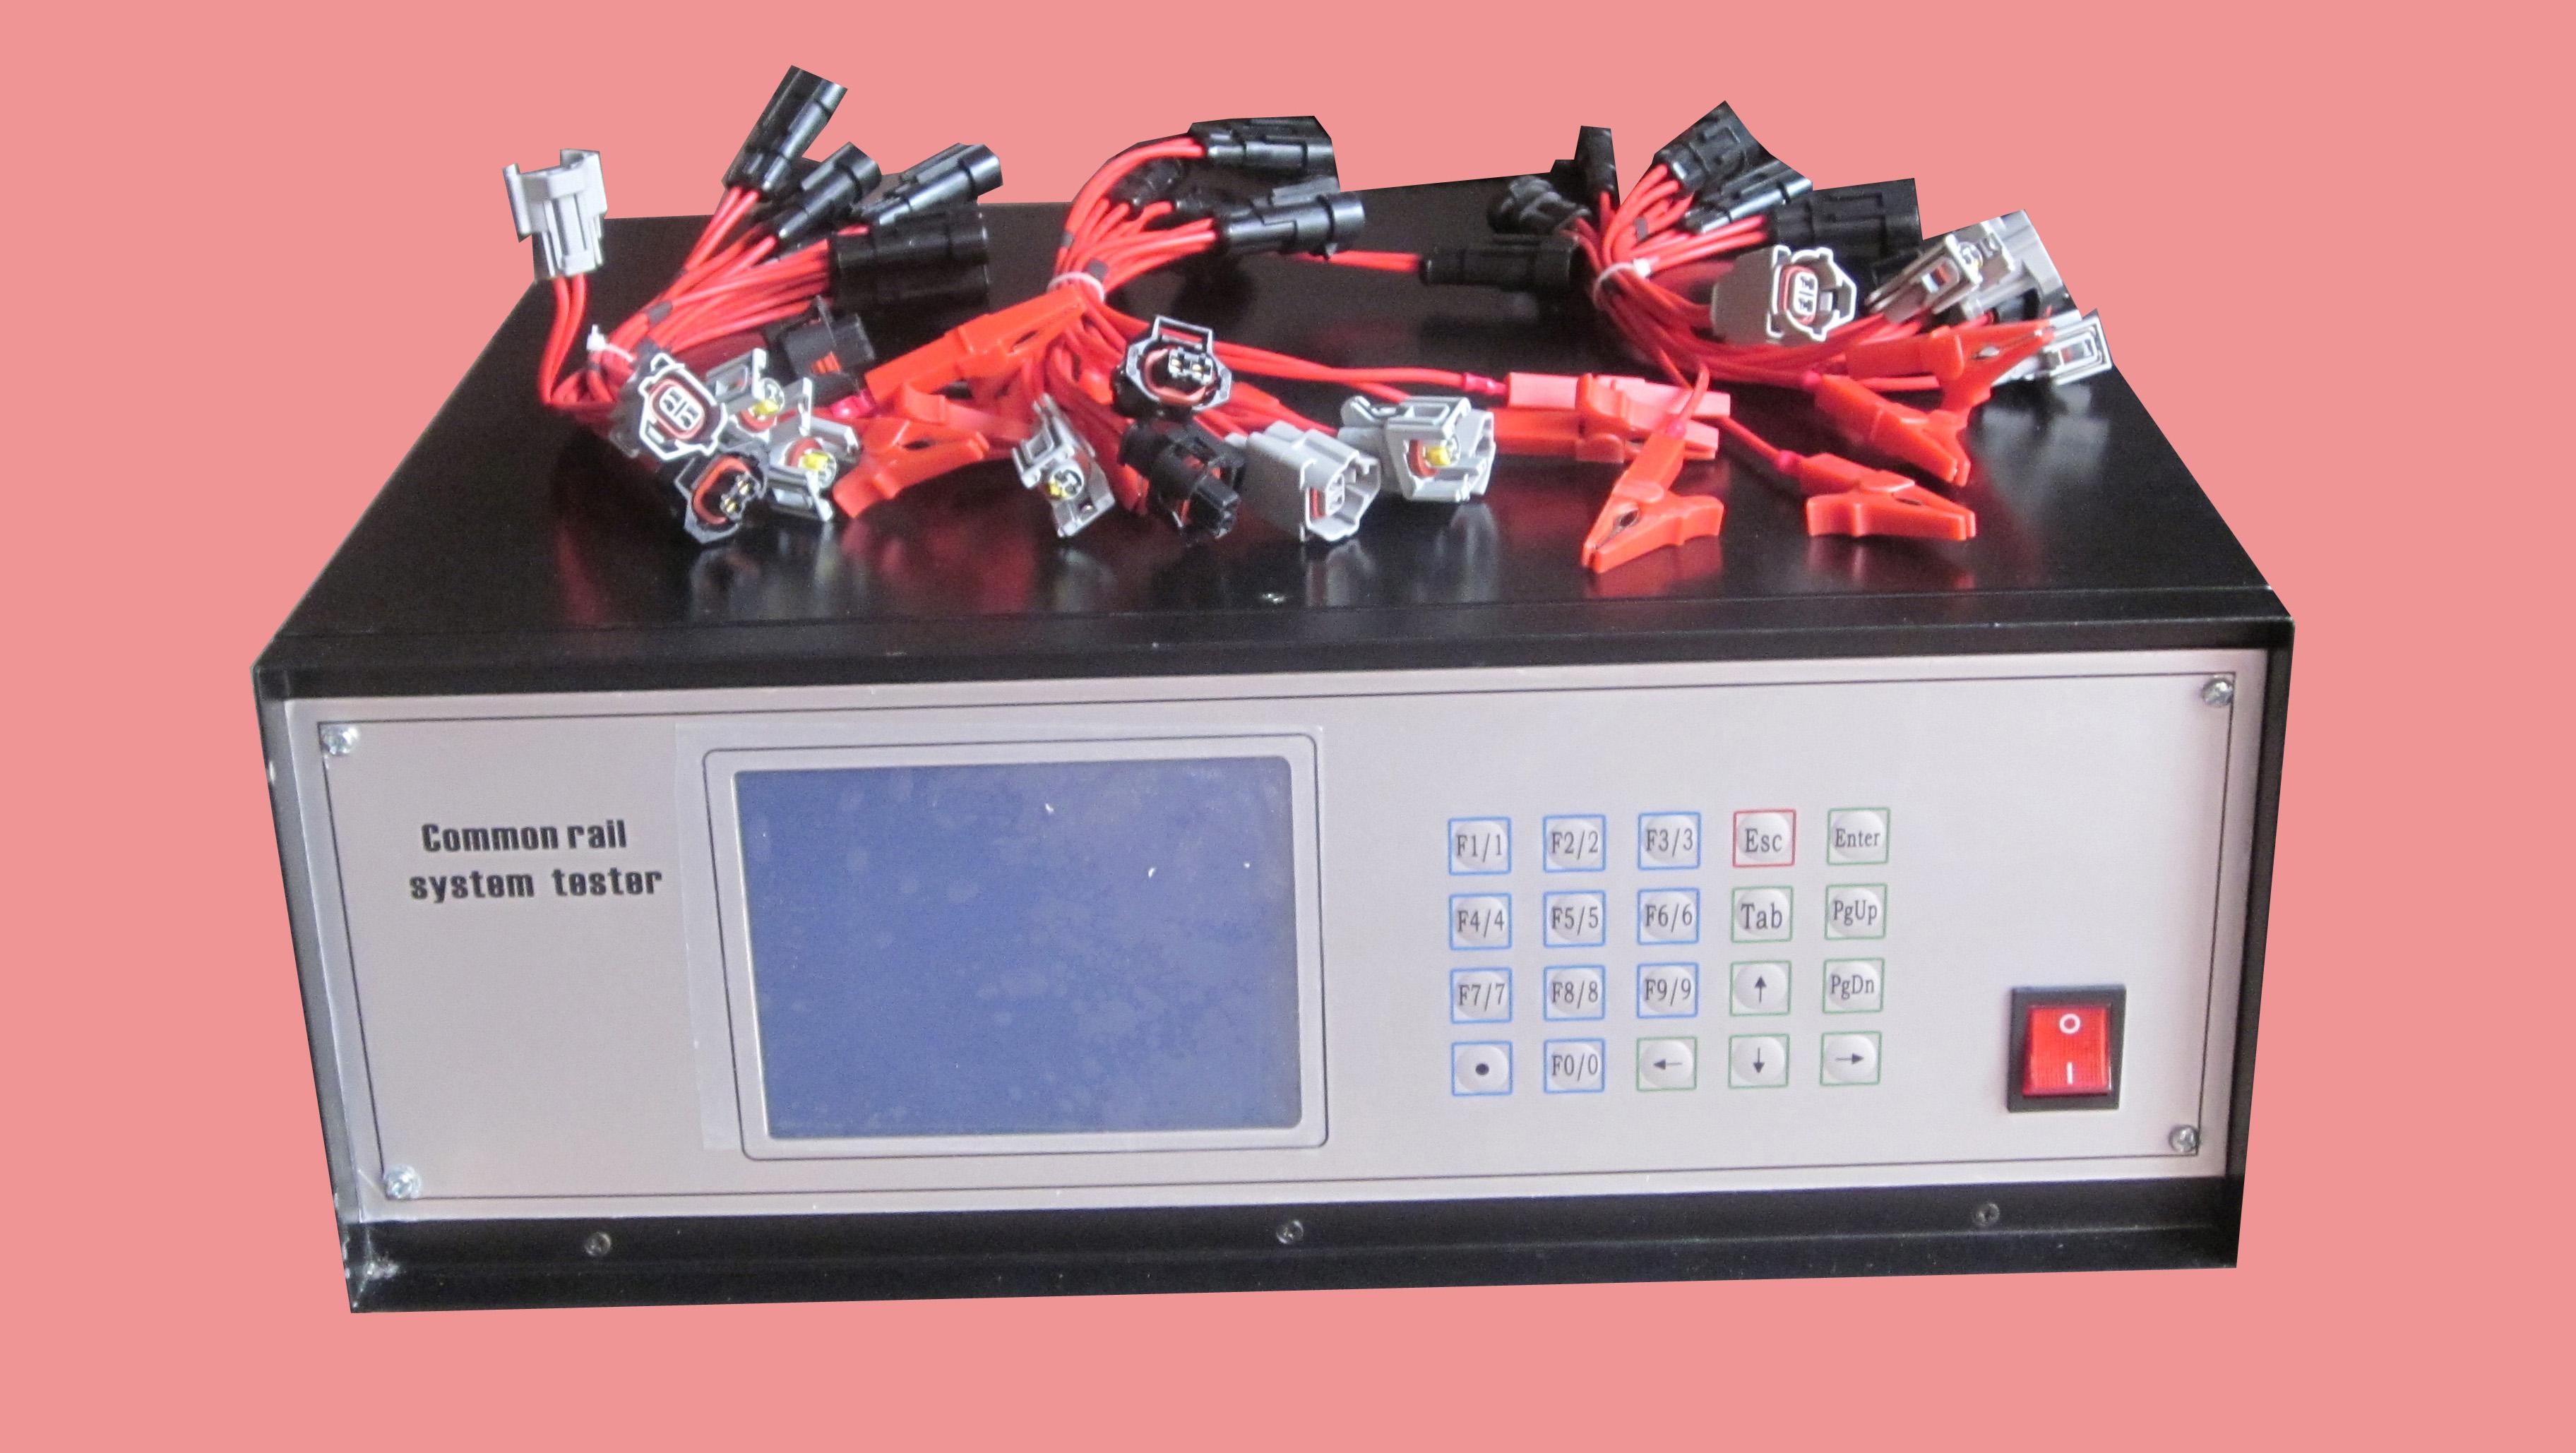 HY-CRSIII 共轨系统检测仪